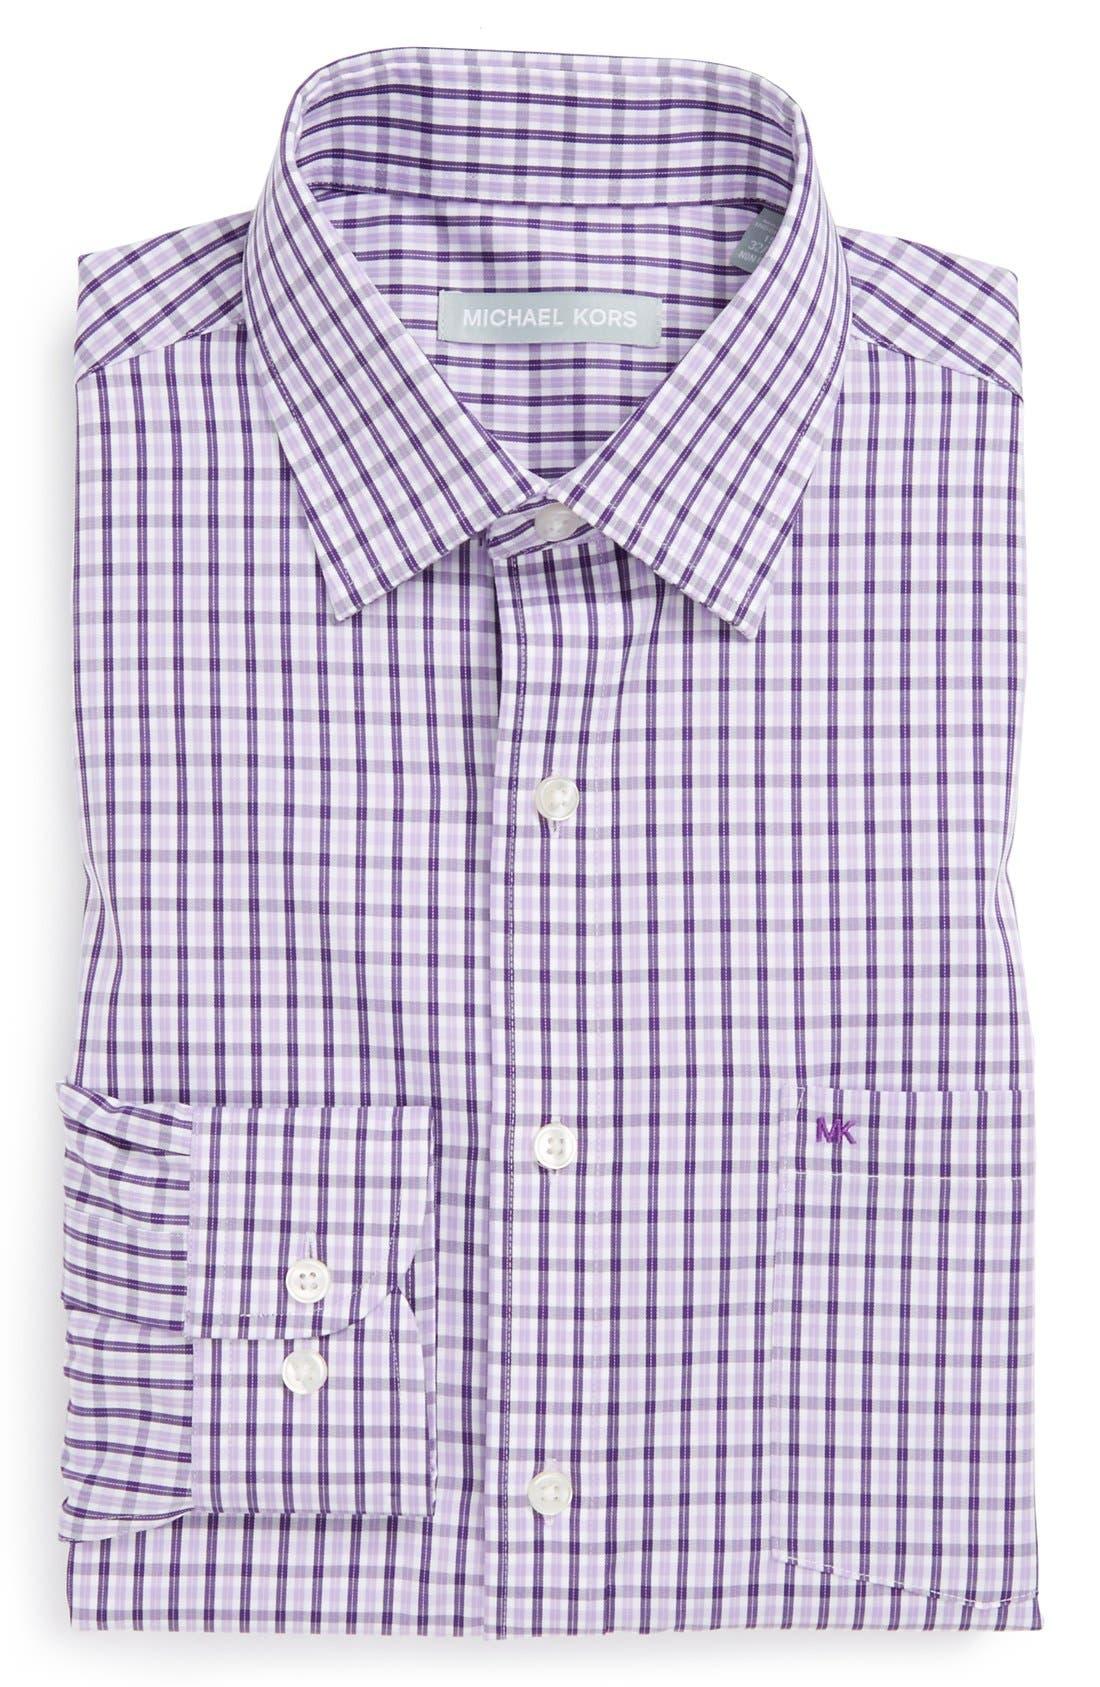 Main Image - Michael Kors Regular Fit Dress Shirt